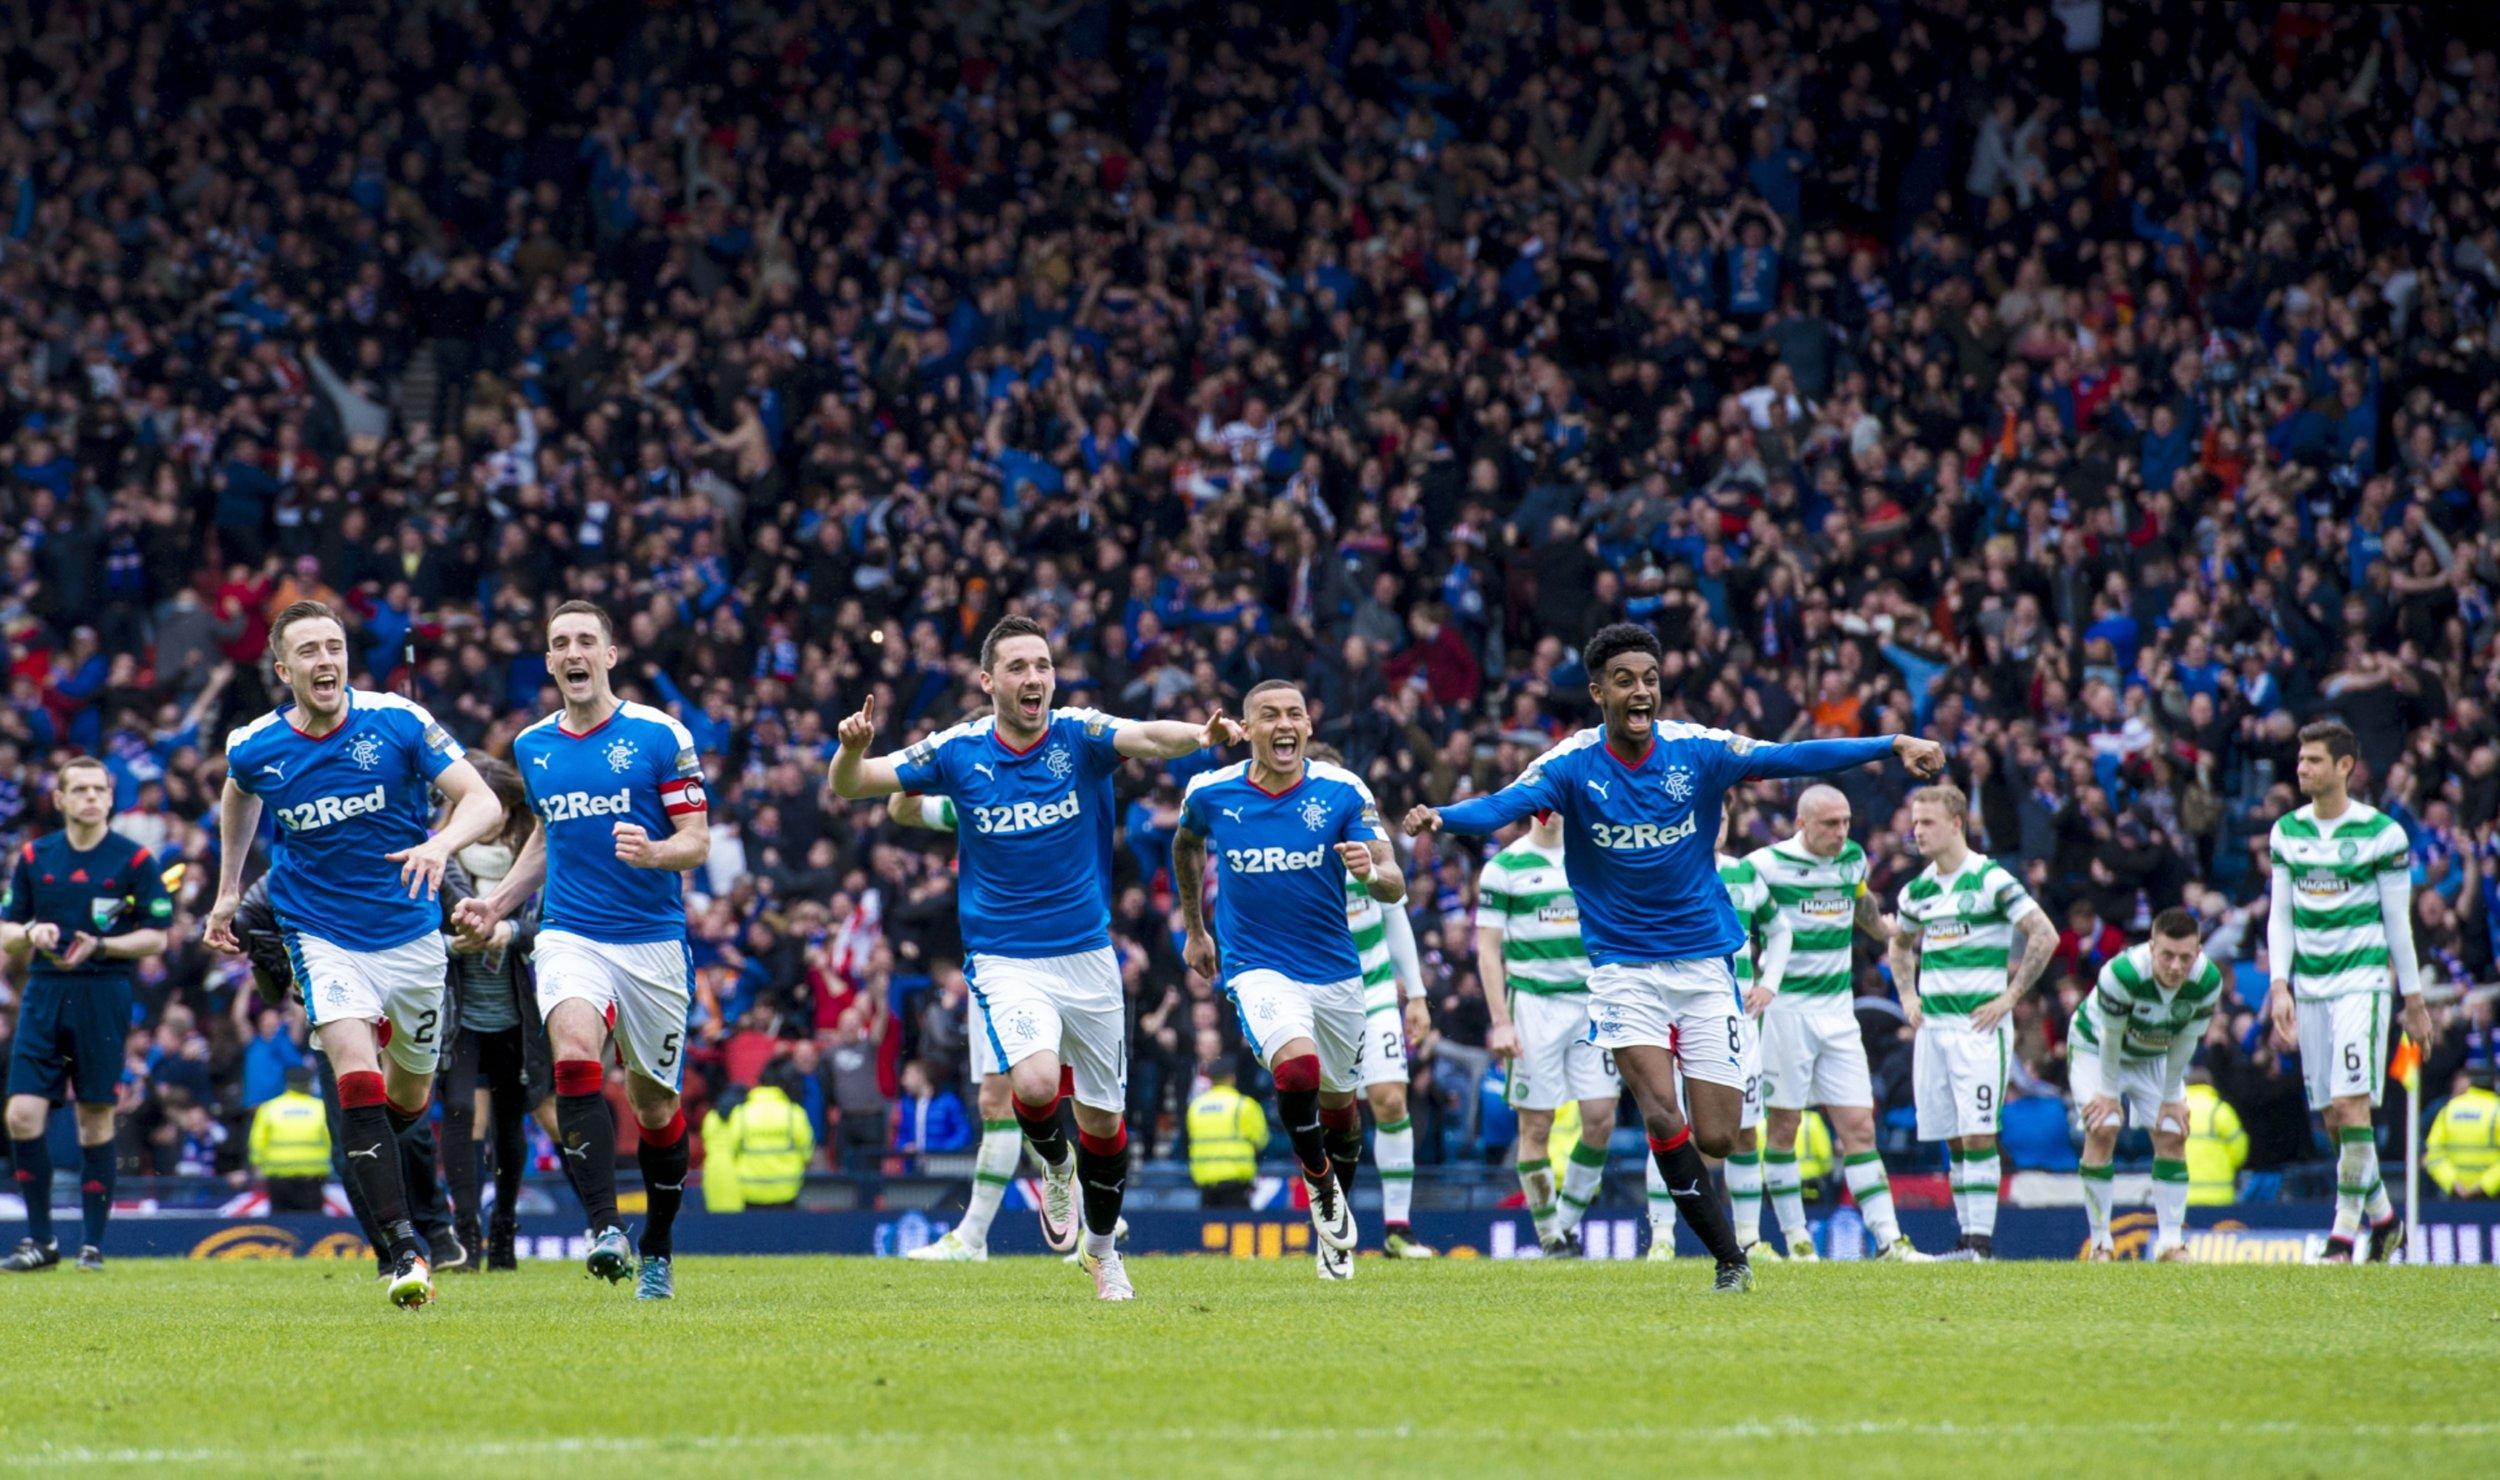 Celtic & Rangers Football Clubs